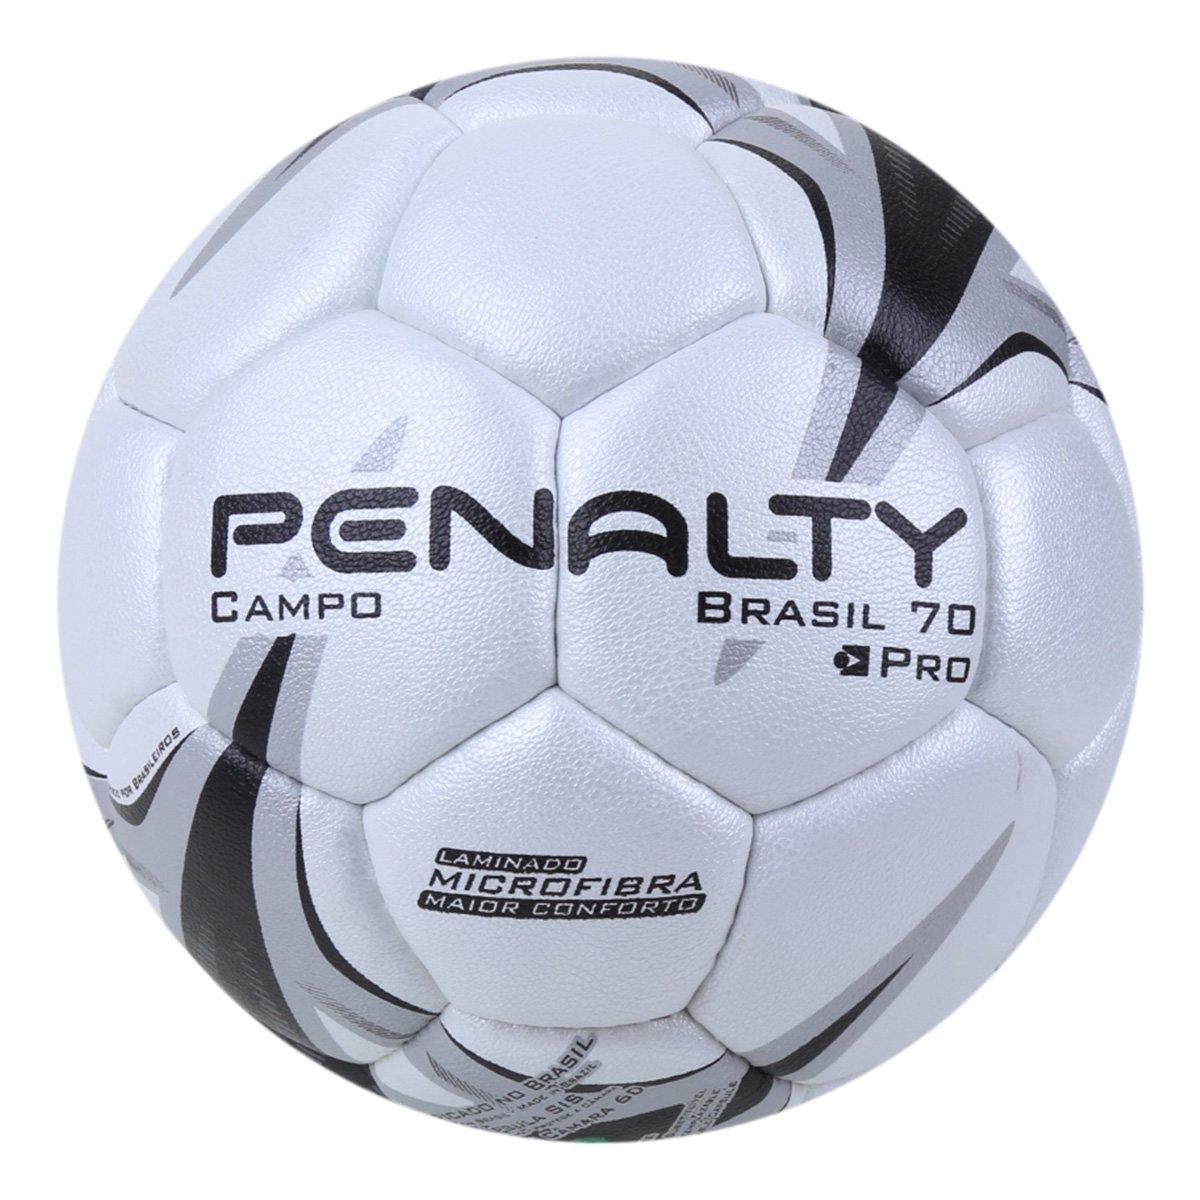 Bola de Futebol Campo Penalty Brasil 70 Pró Juvenil N4 X